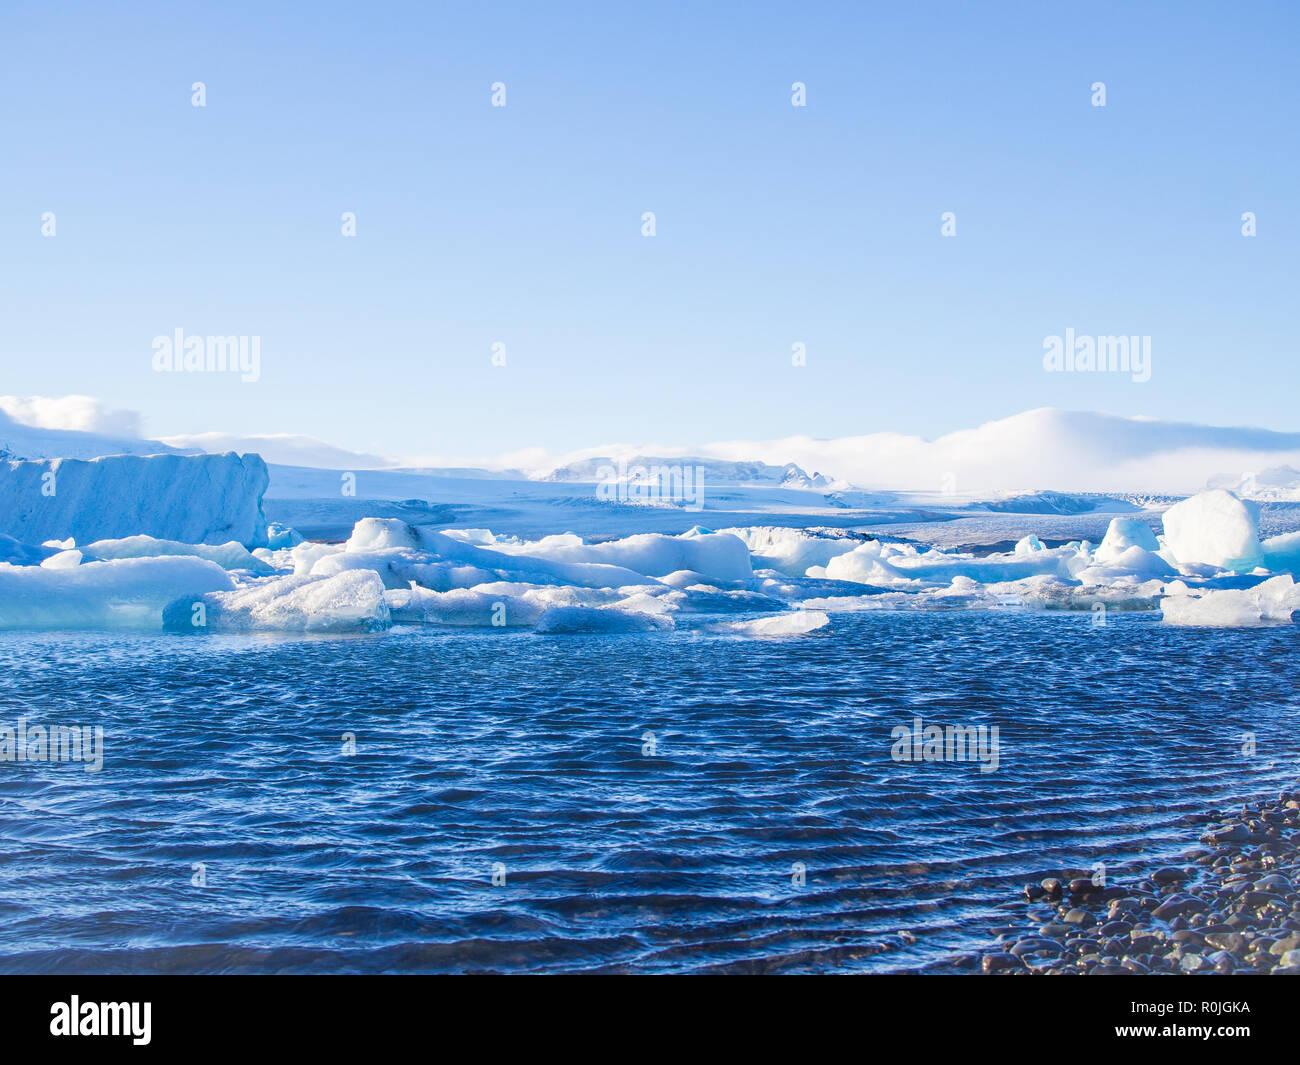 Jokulsarlon glasier lagoon in Iceland in evening - Stock Image